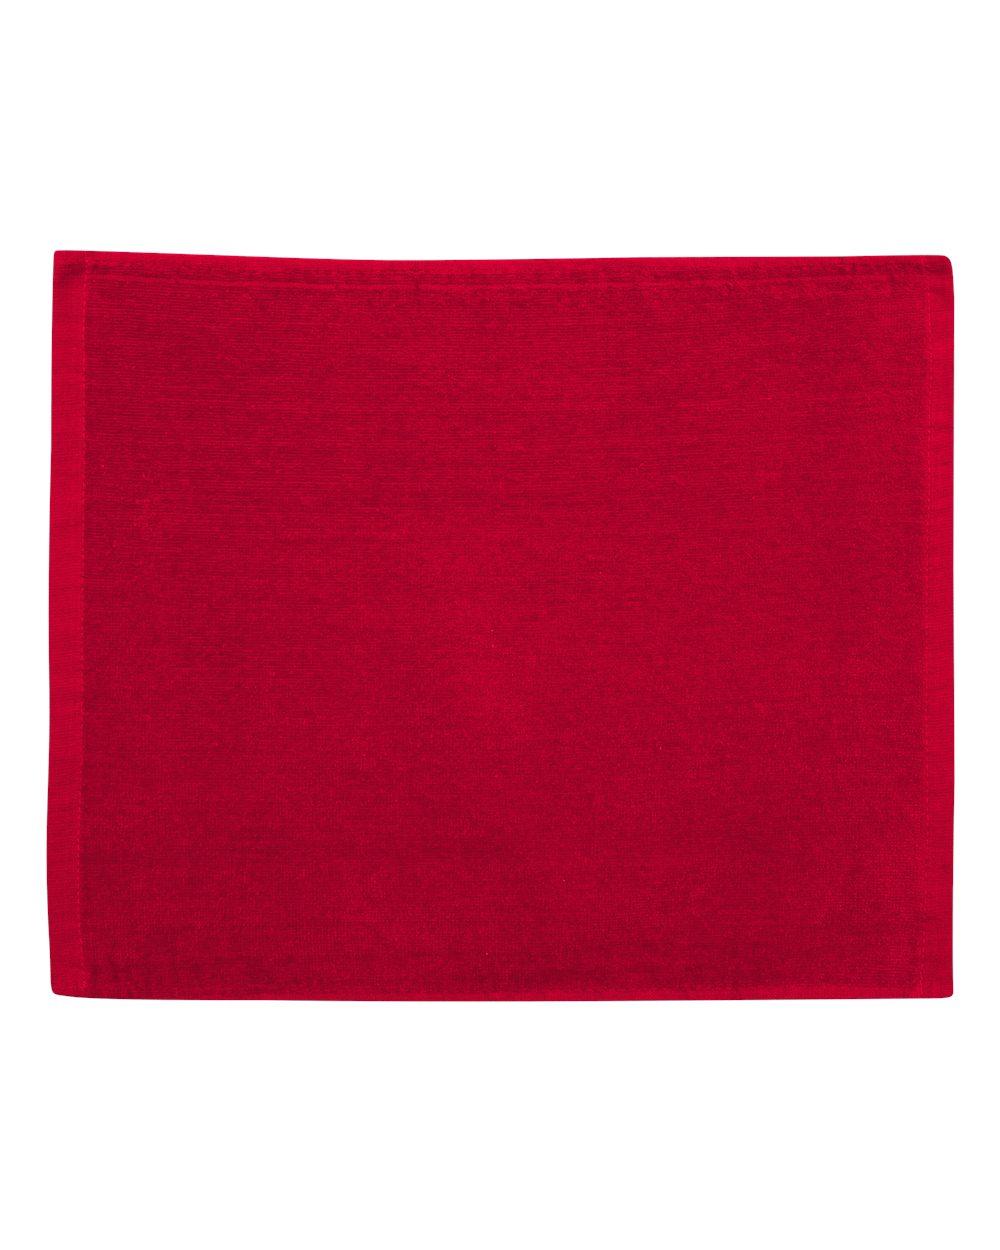 Carmel Towel Company C1518 - Velour Hemmed Towel